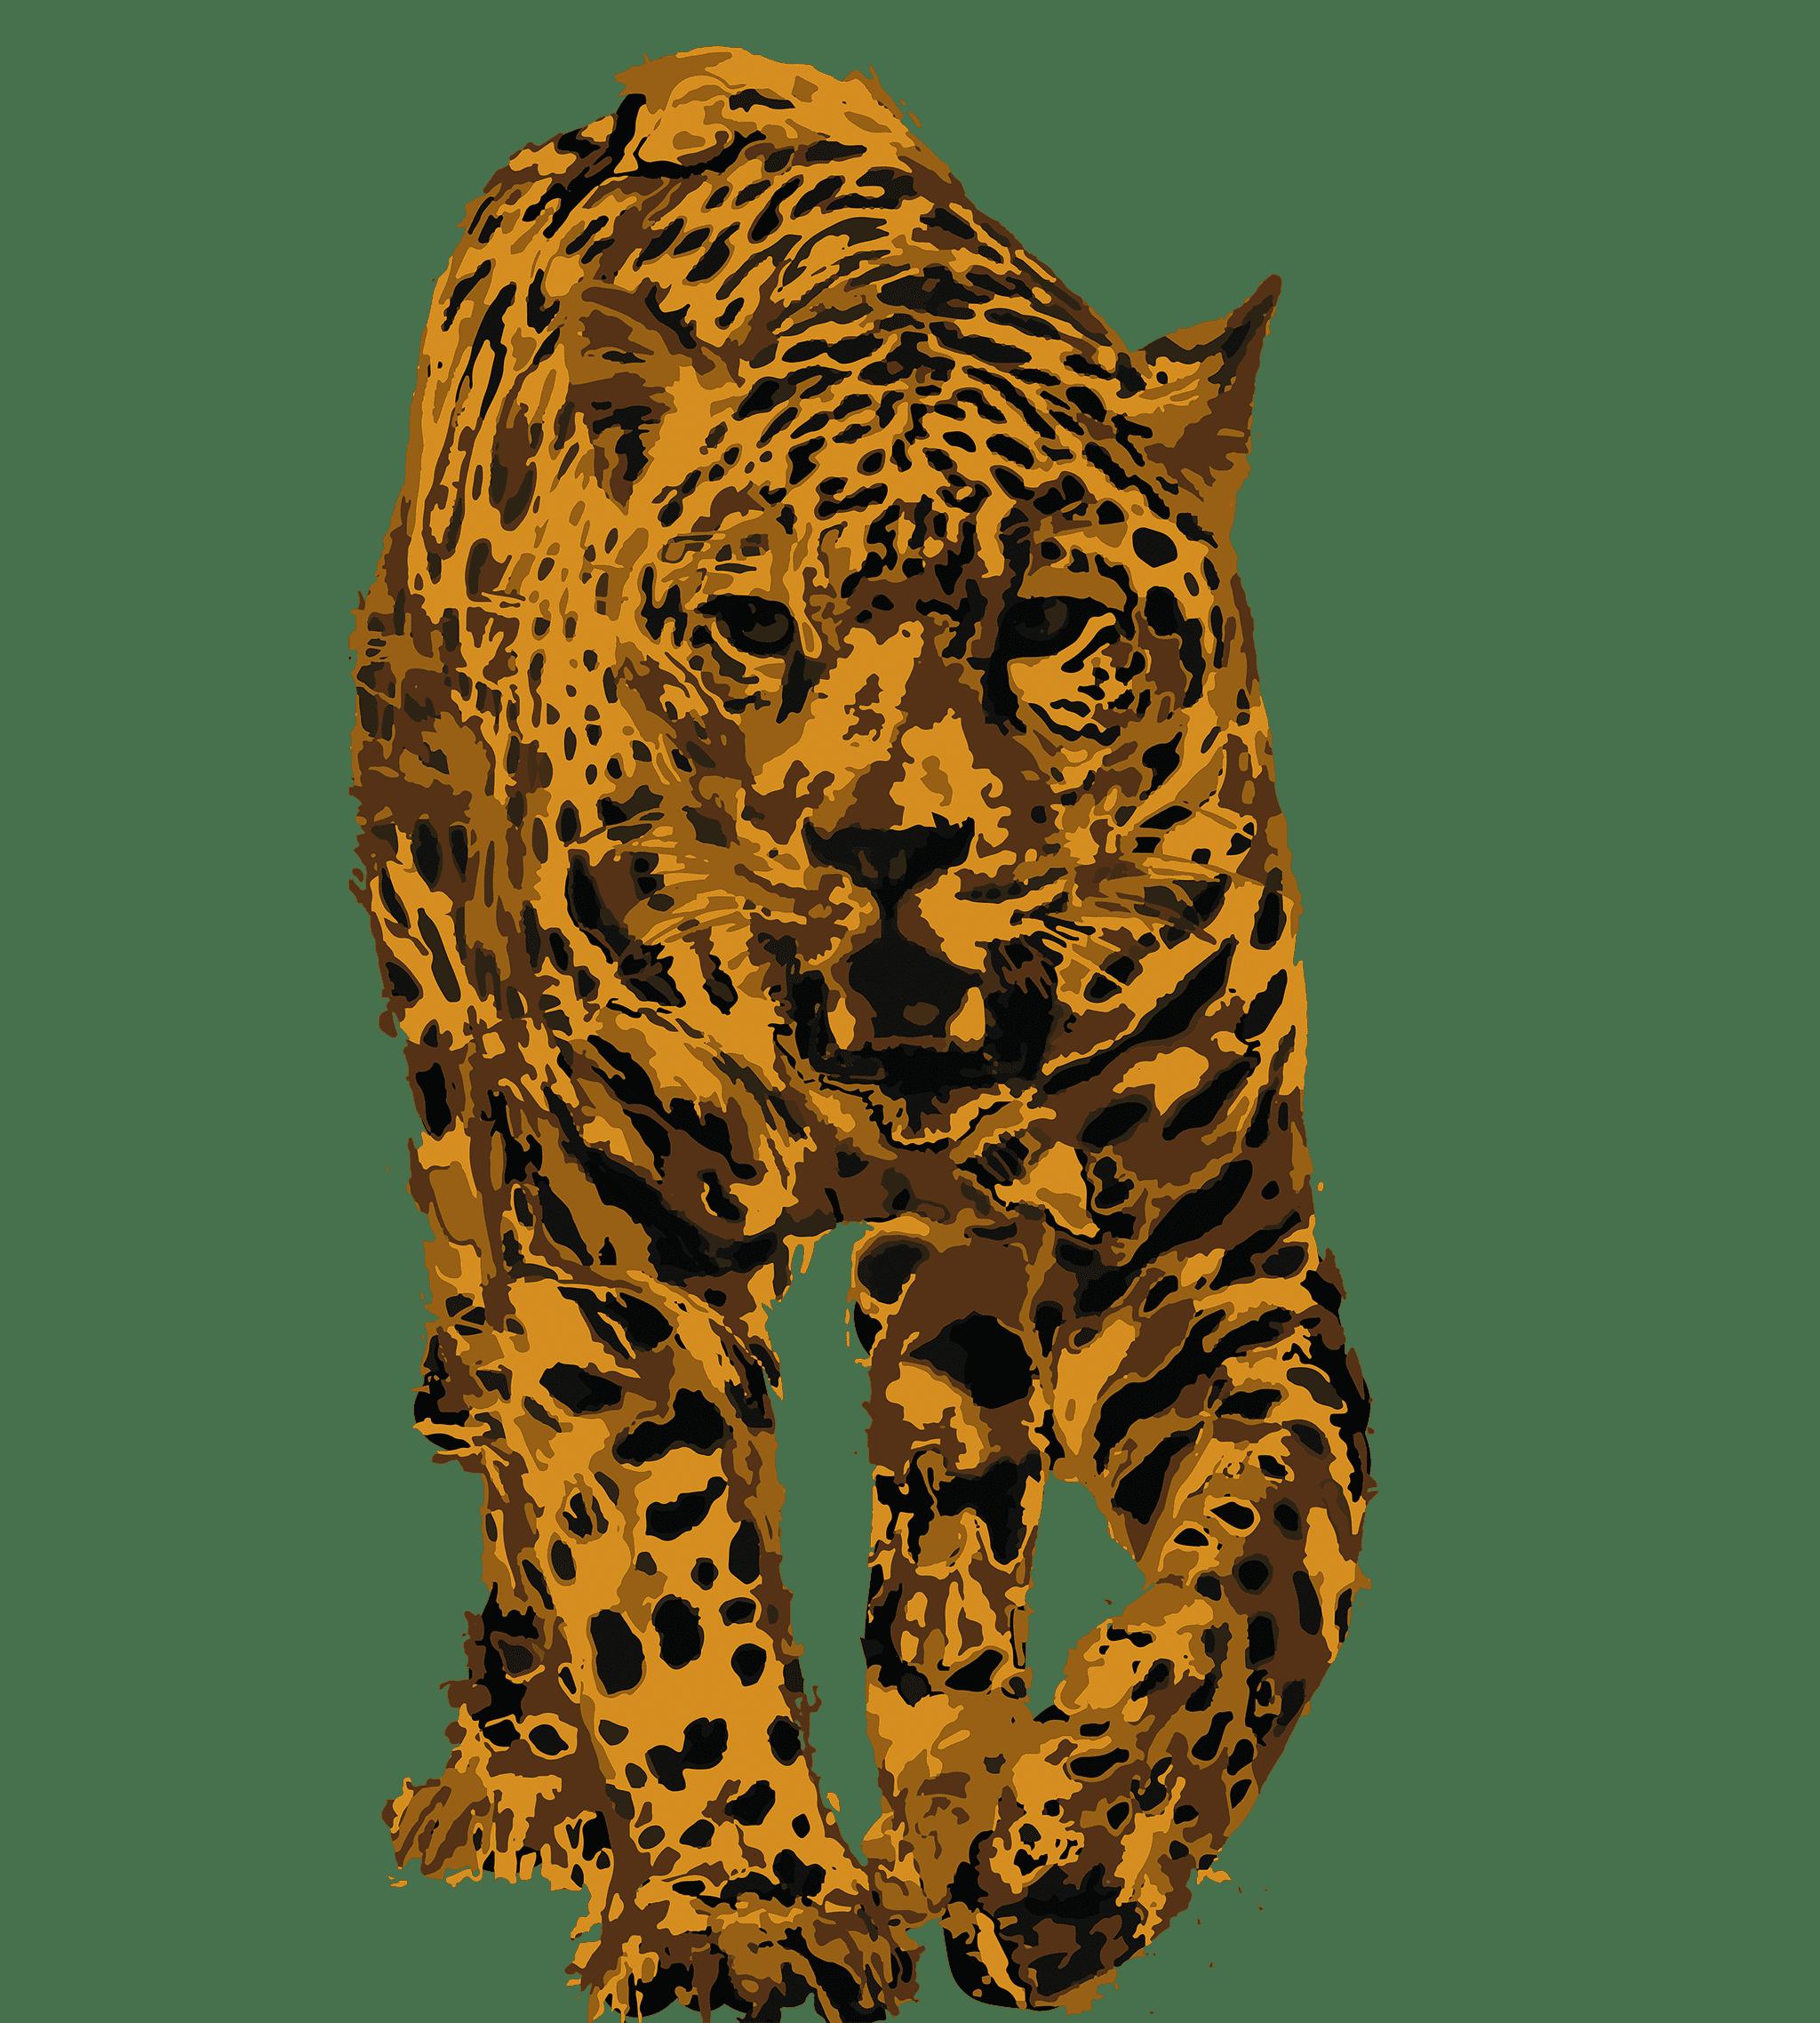 Jaguar autóctono, representando café de especialidad